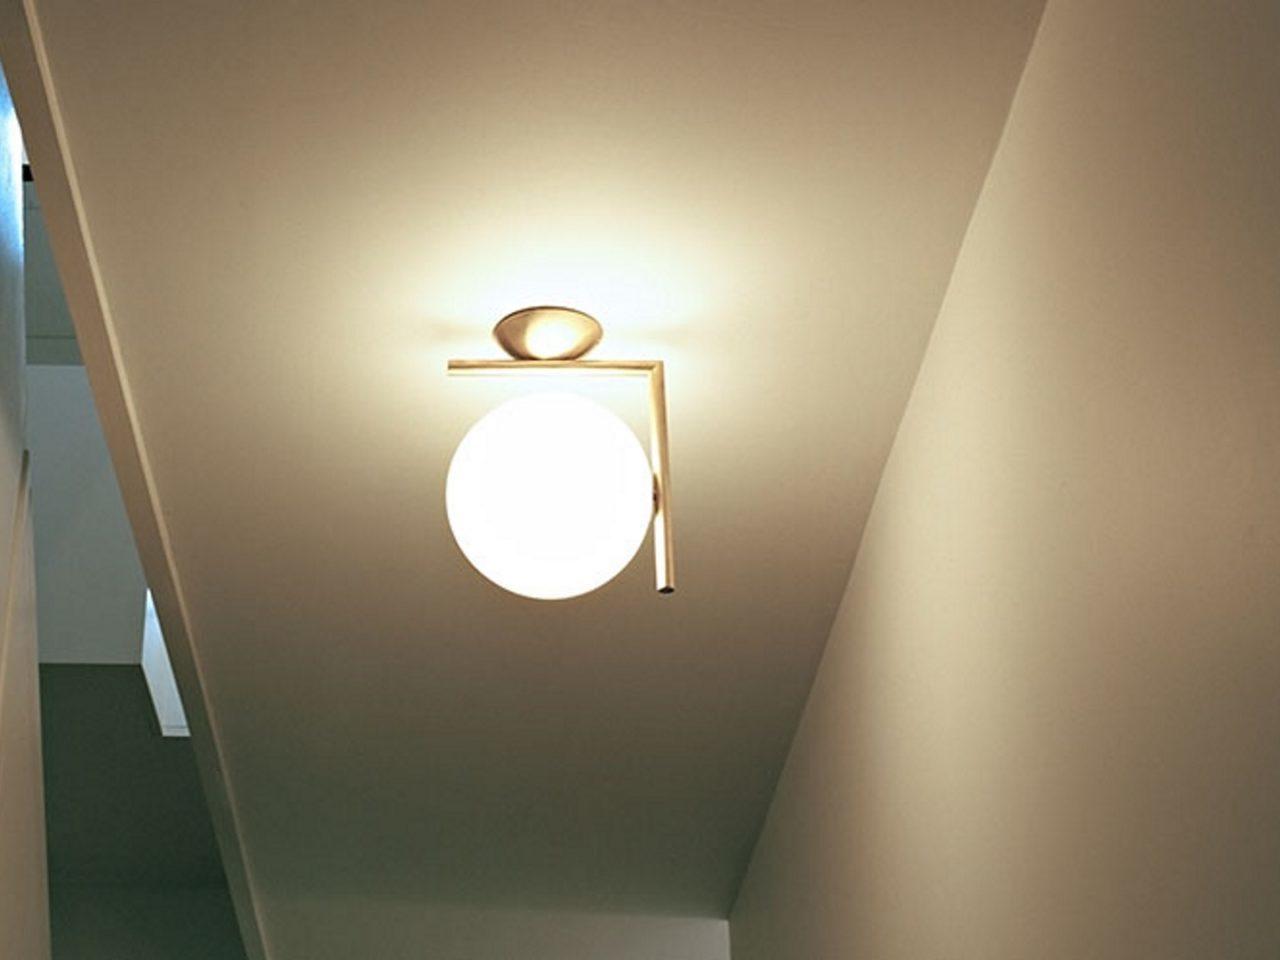 Plafoniere Flos : Lampadario flos ic s2: lampada t die besten bilder von